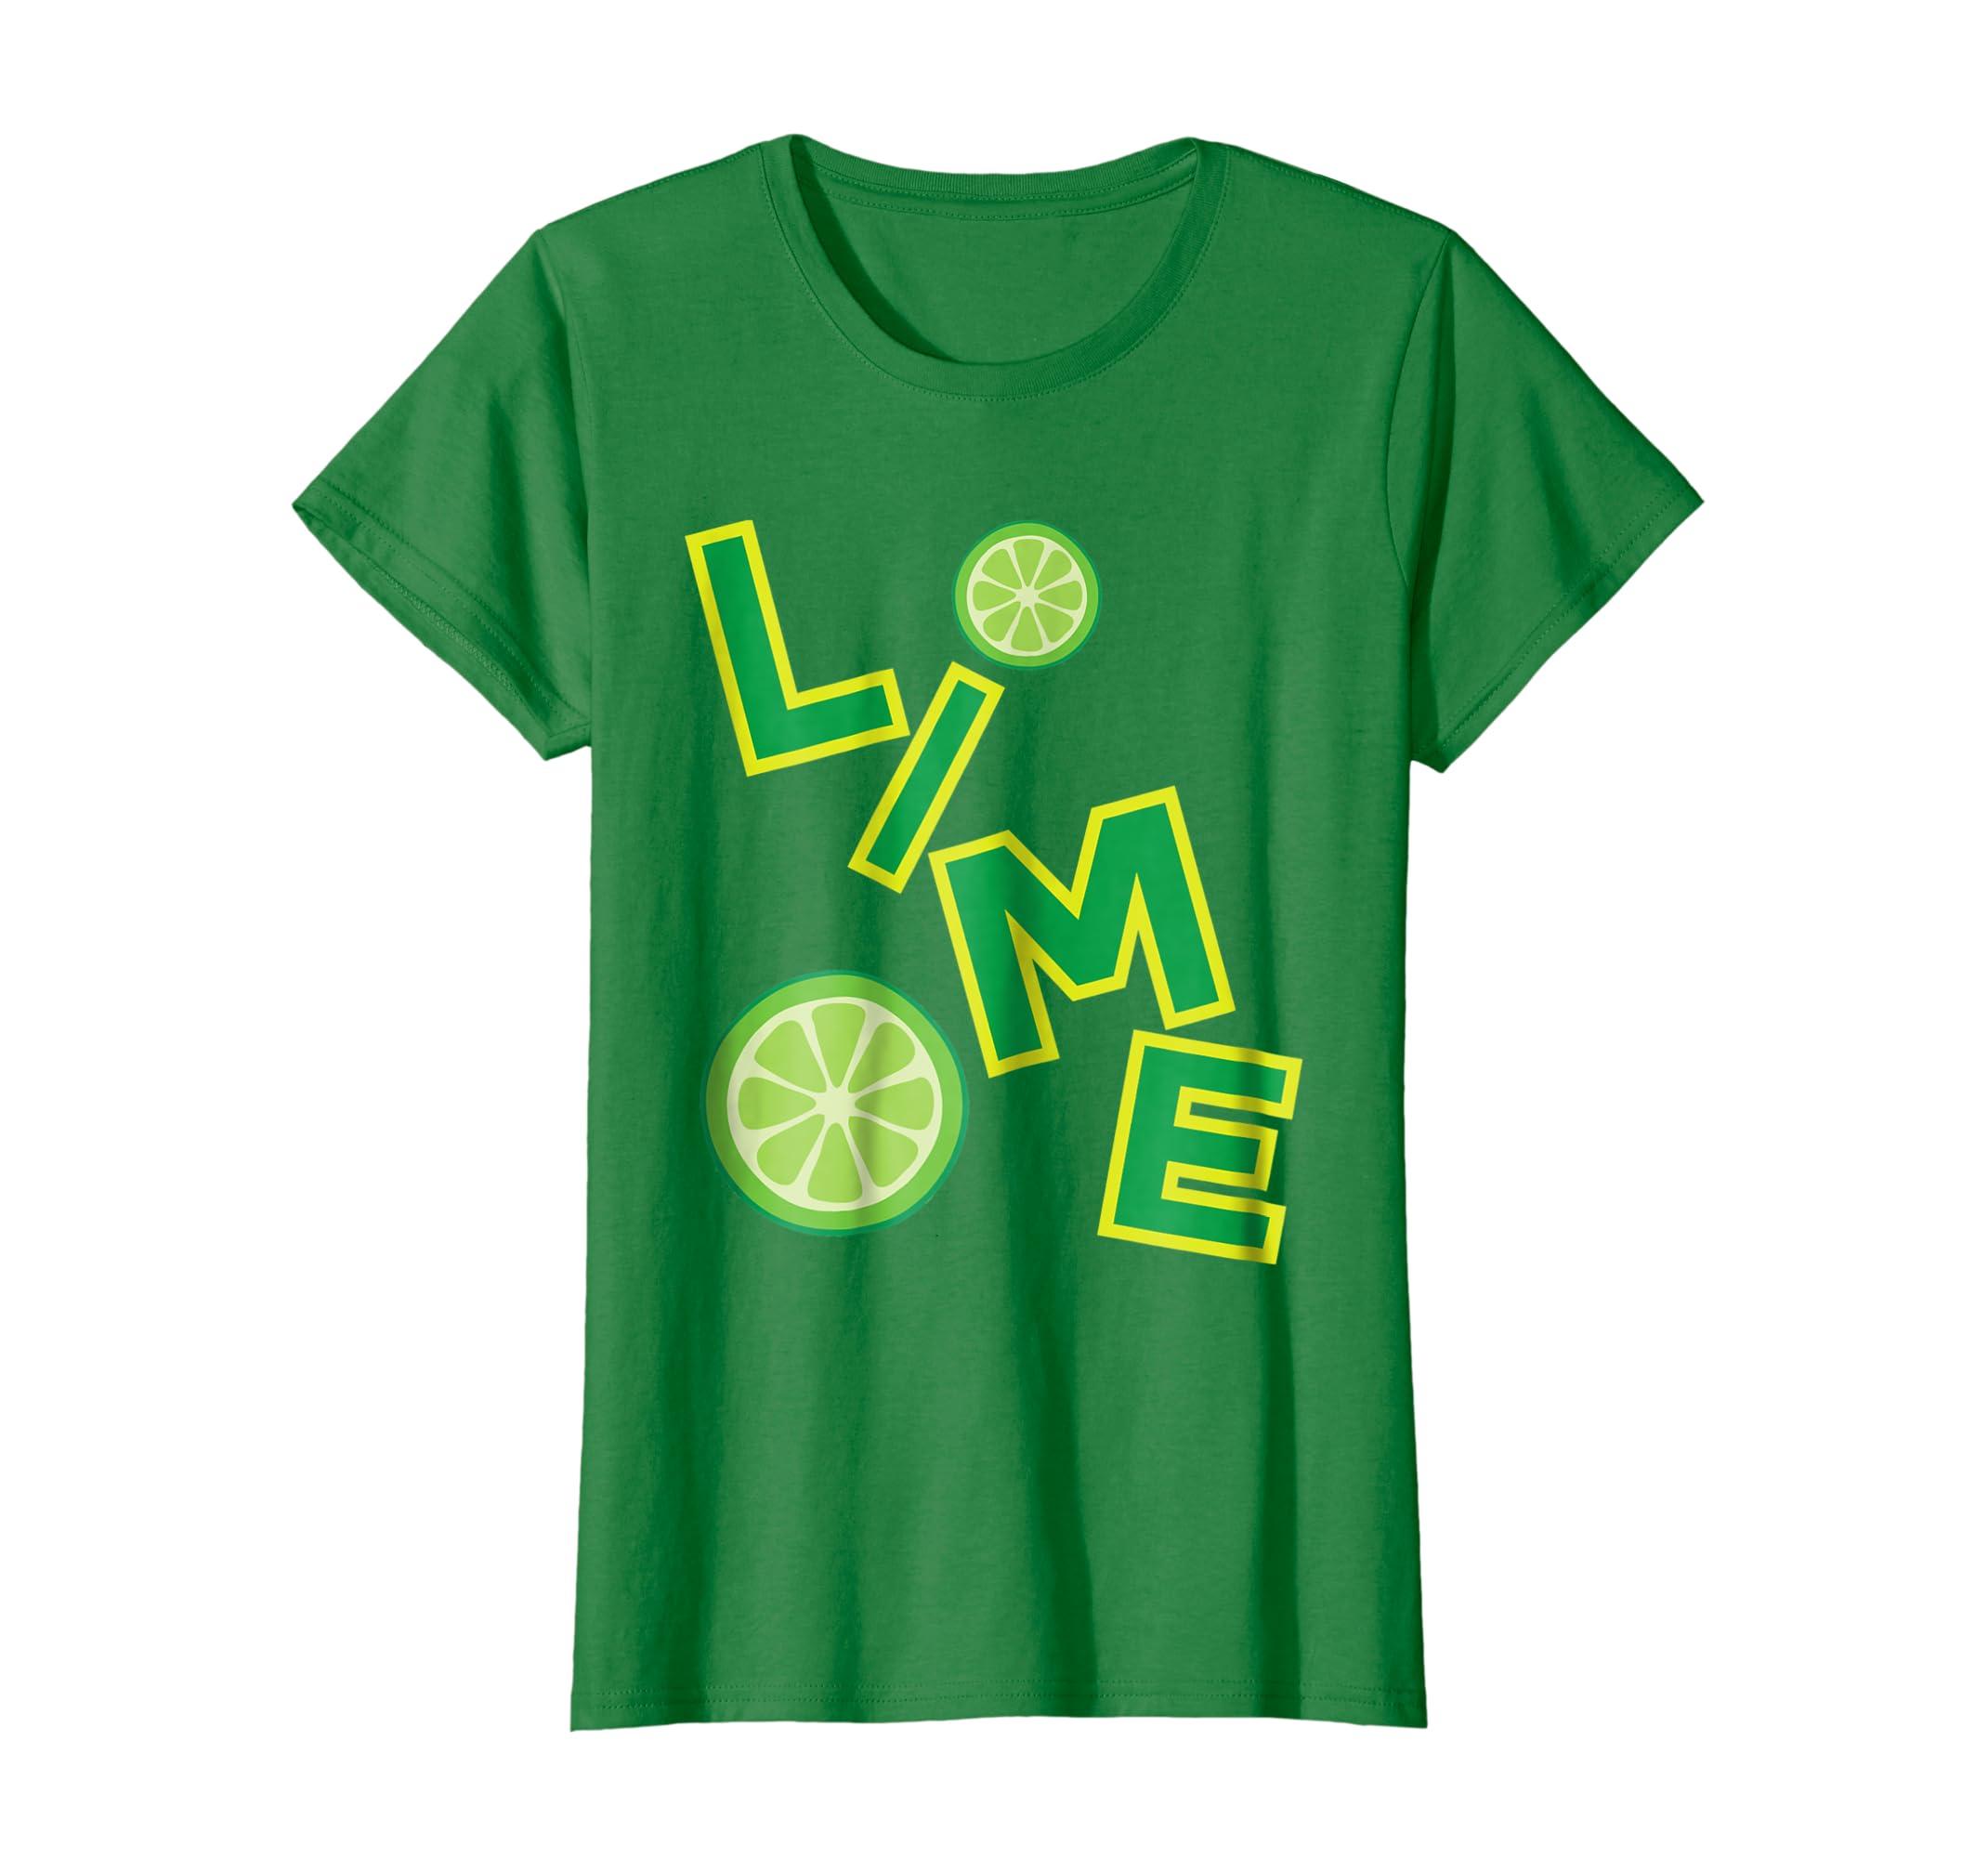 Lime Salt Tequila Halloween Costume T Shirt Group Matching-Colonhue